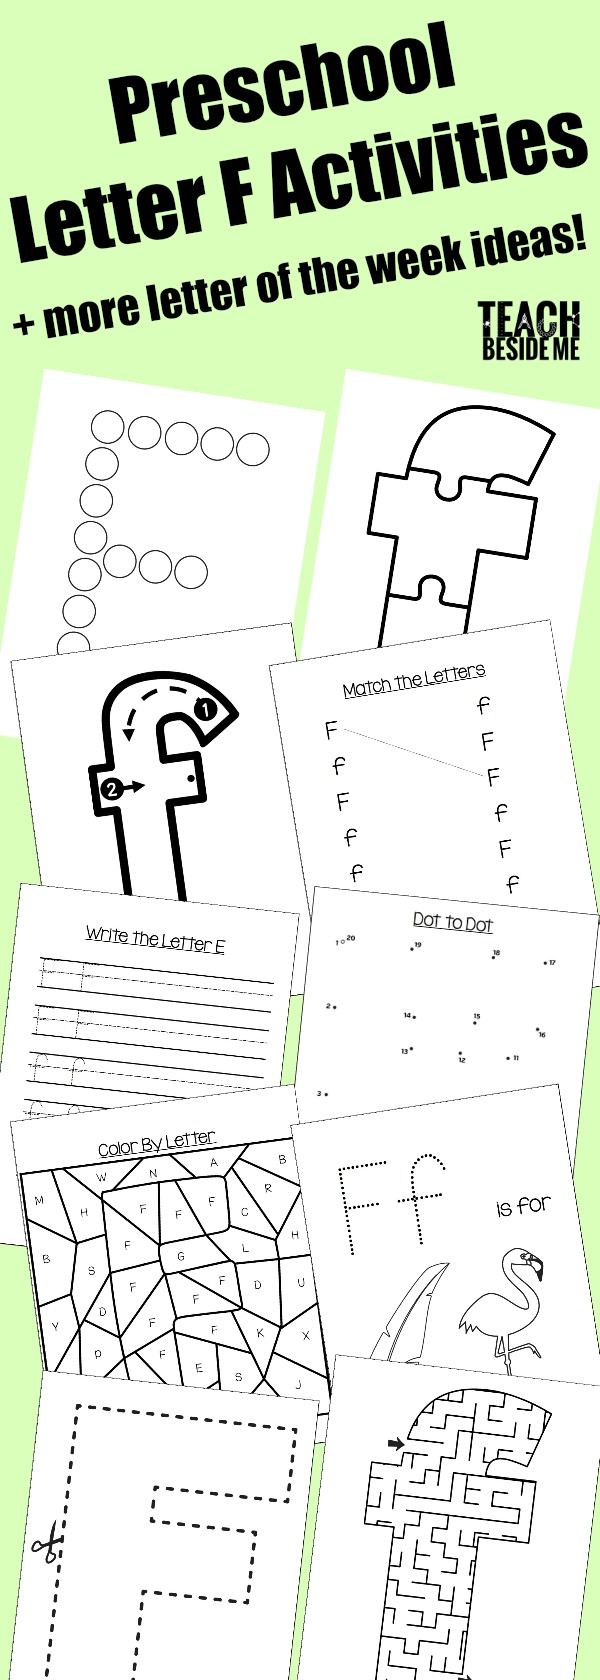 preschool letter f activities letter of the week teach beside me. Black Bedroom Furniture Sets. Home Design Ideas